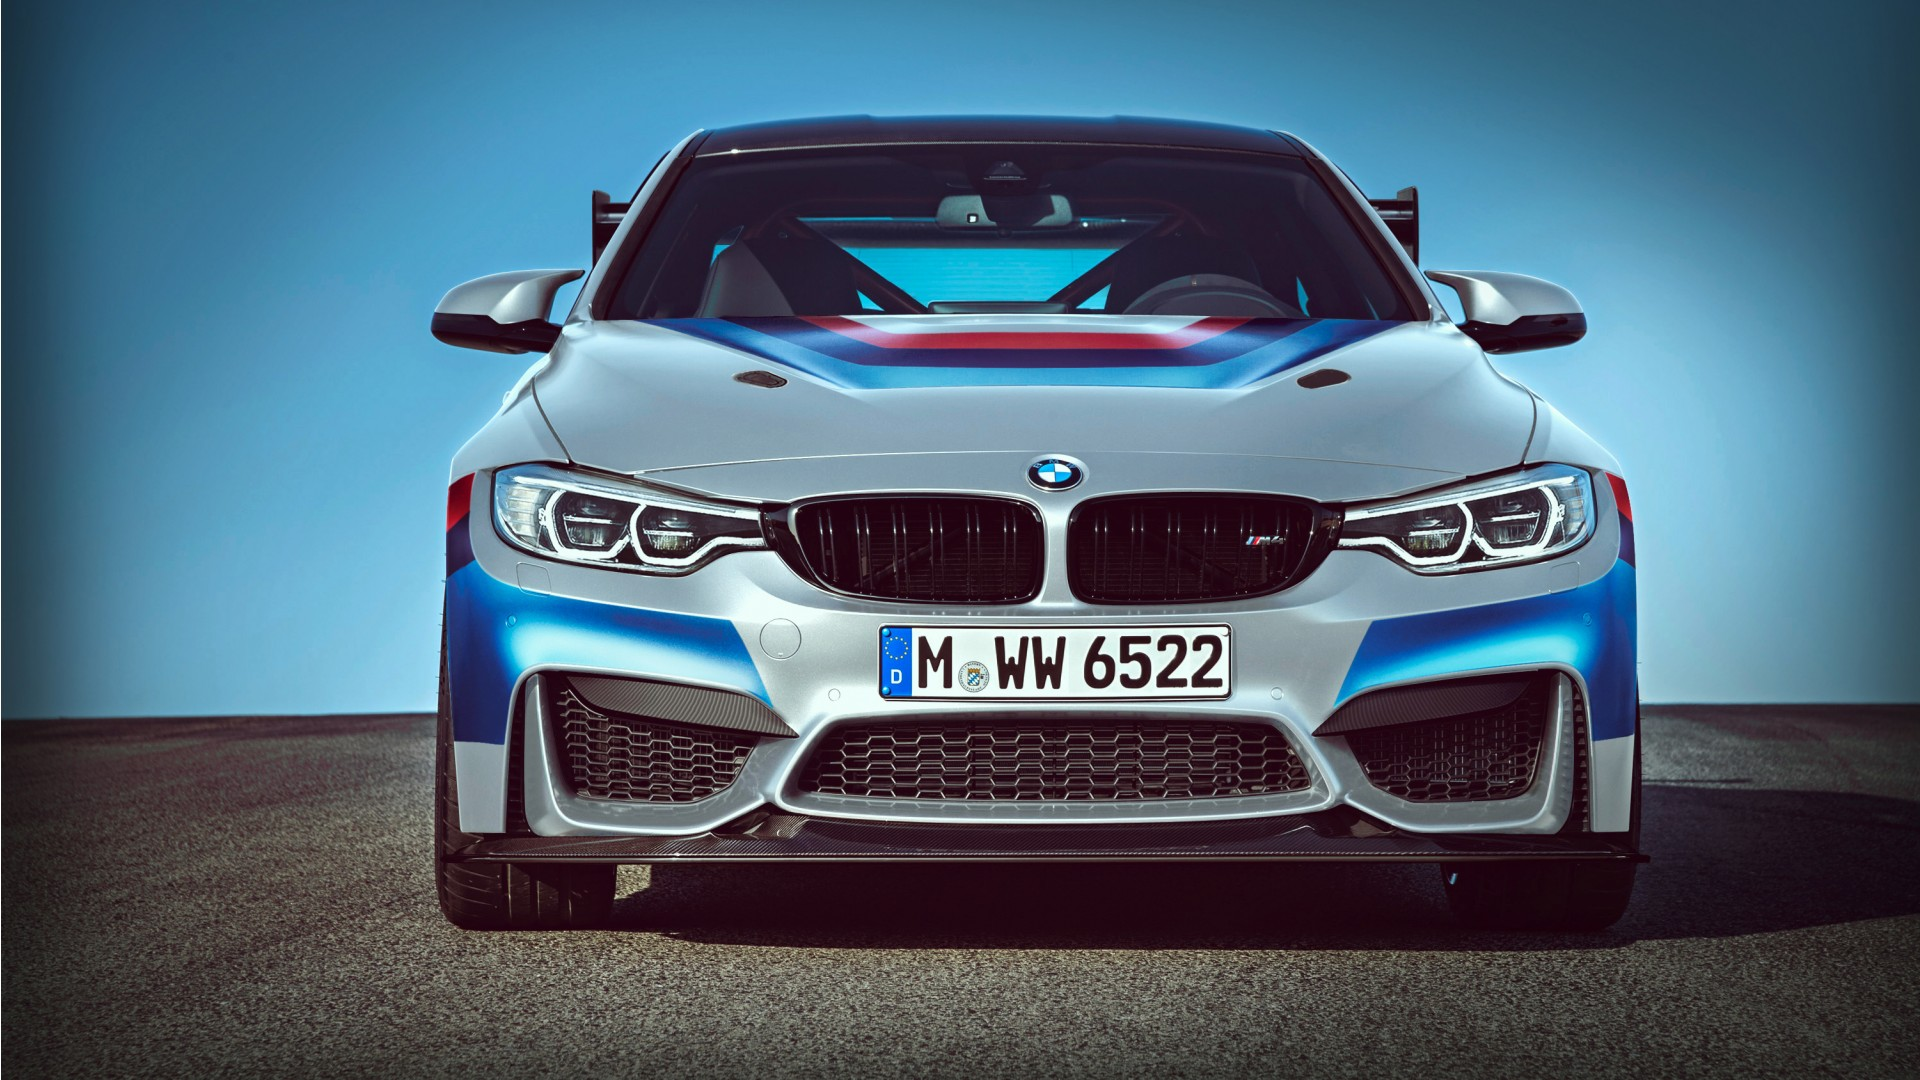 Honda Cars 2015 >> BMW M4 GTS 2017 Wallpaper | HD Car Wallpapers | ID #8107